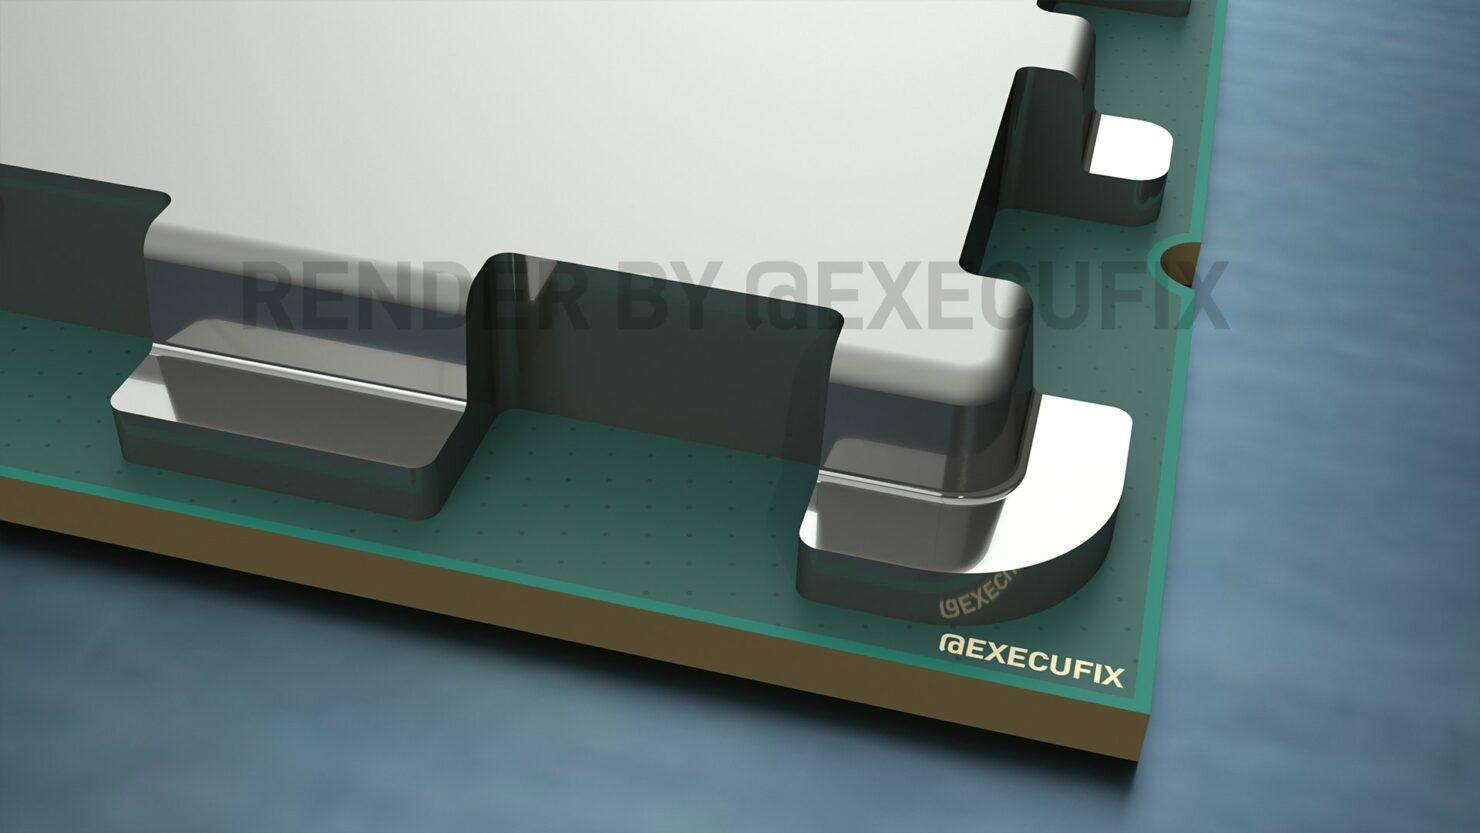 amd-ryzen-raphael-zen-4-desktop-cpus-for-am5-lga-1718-socket-platform-package-pictured-_3